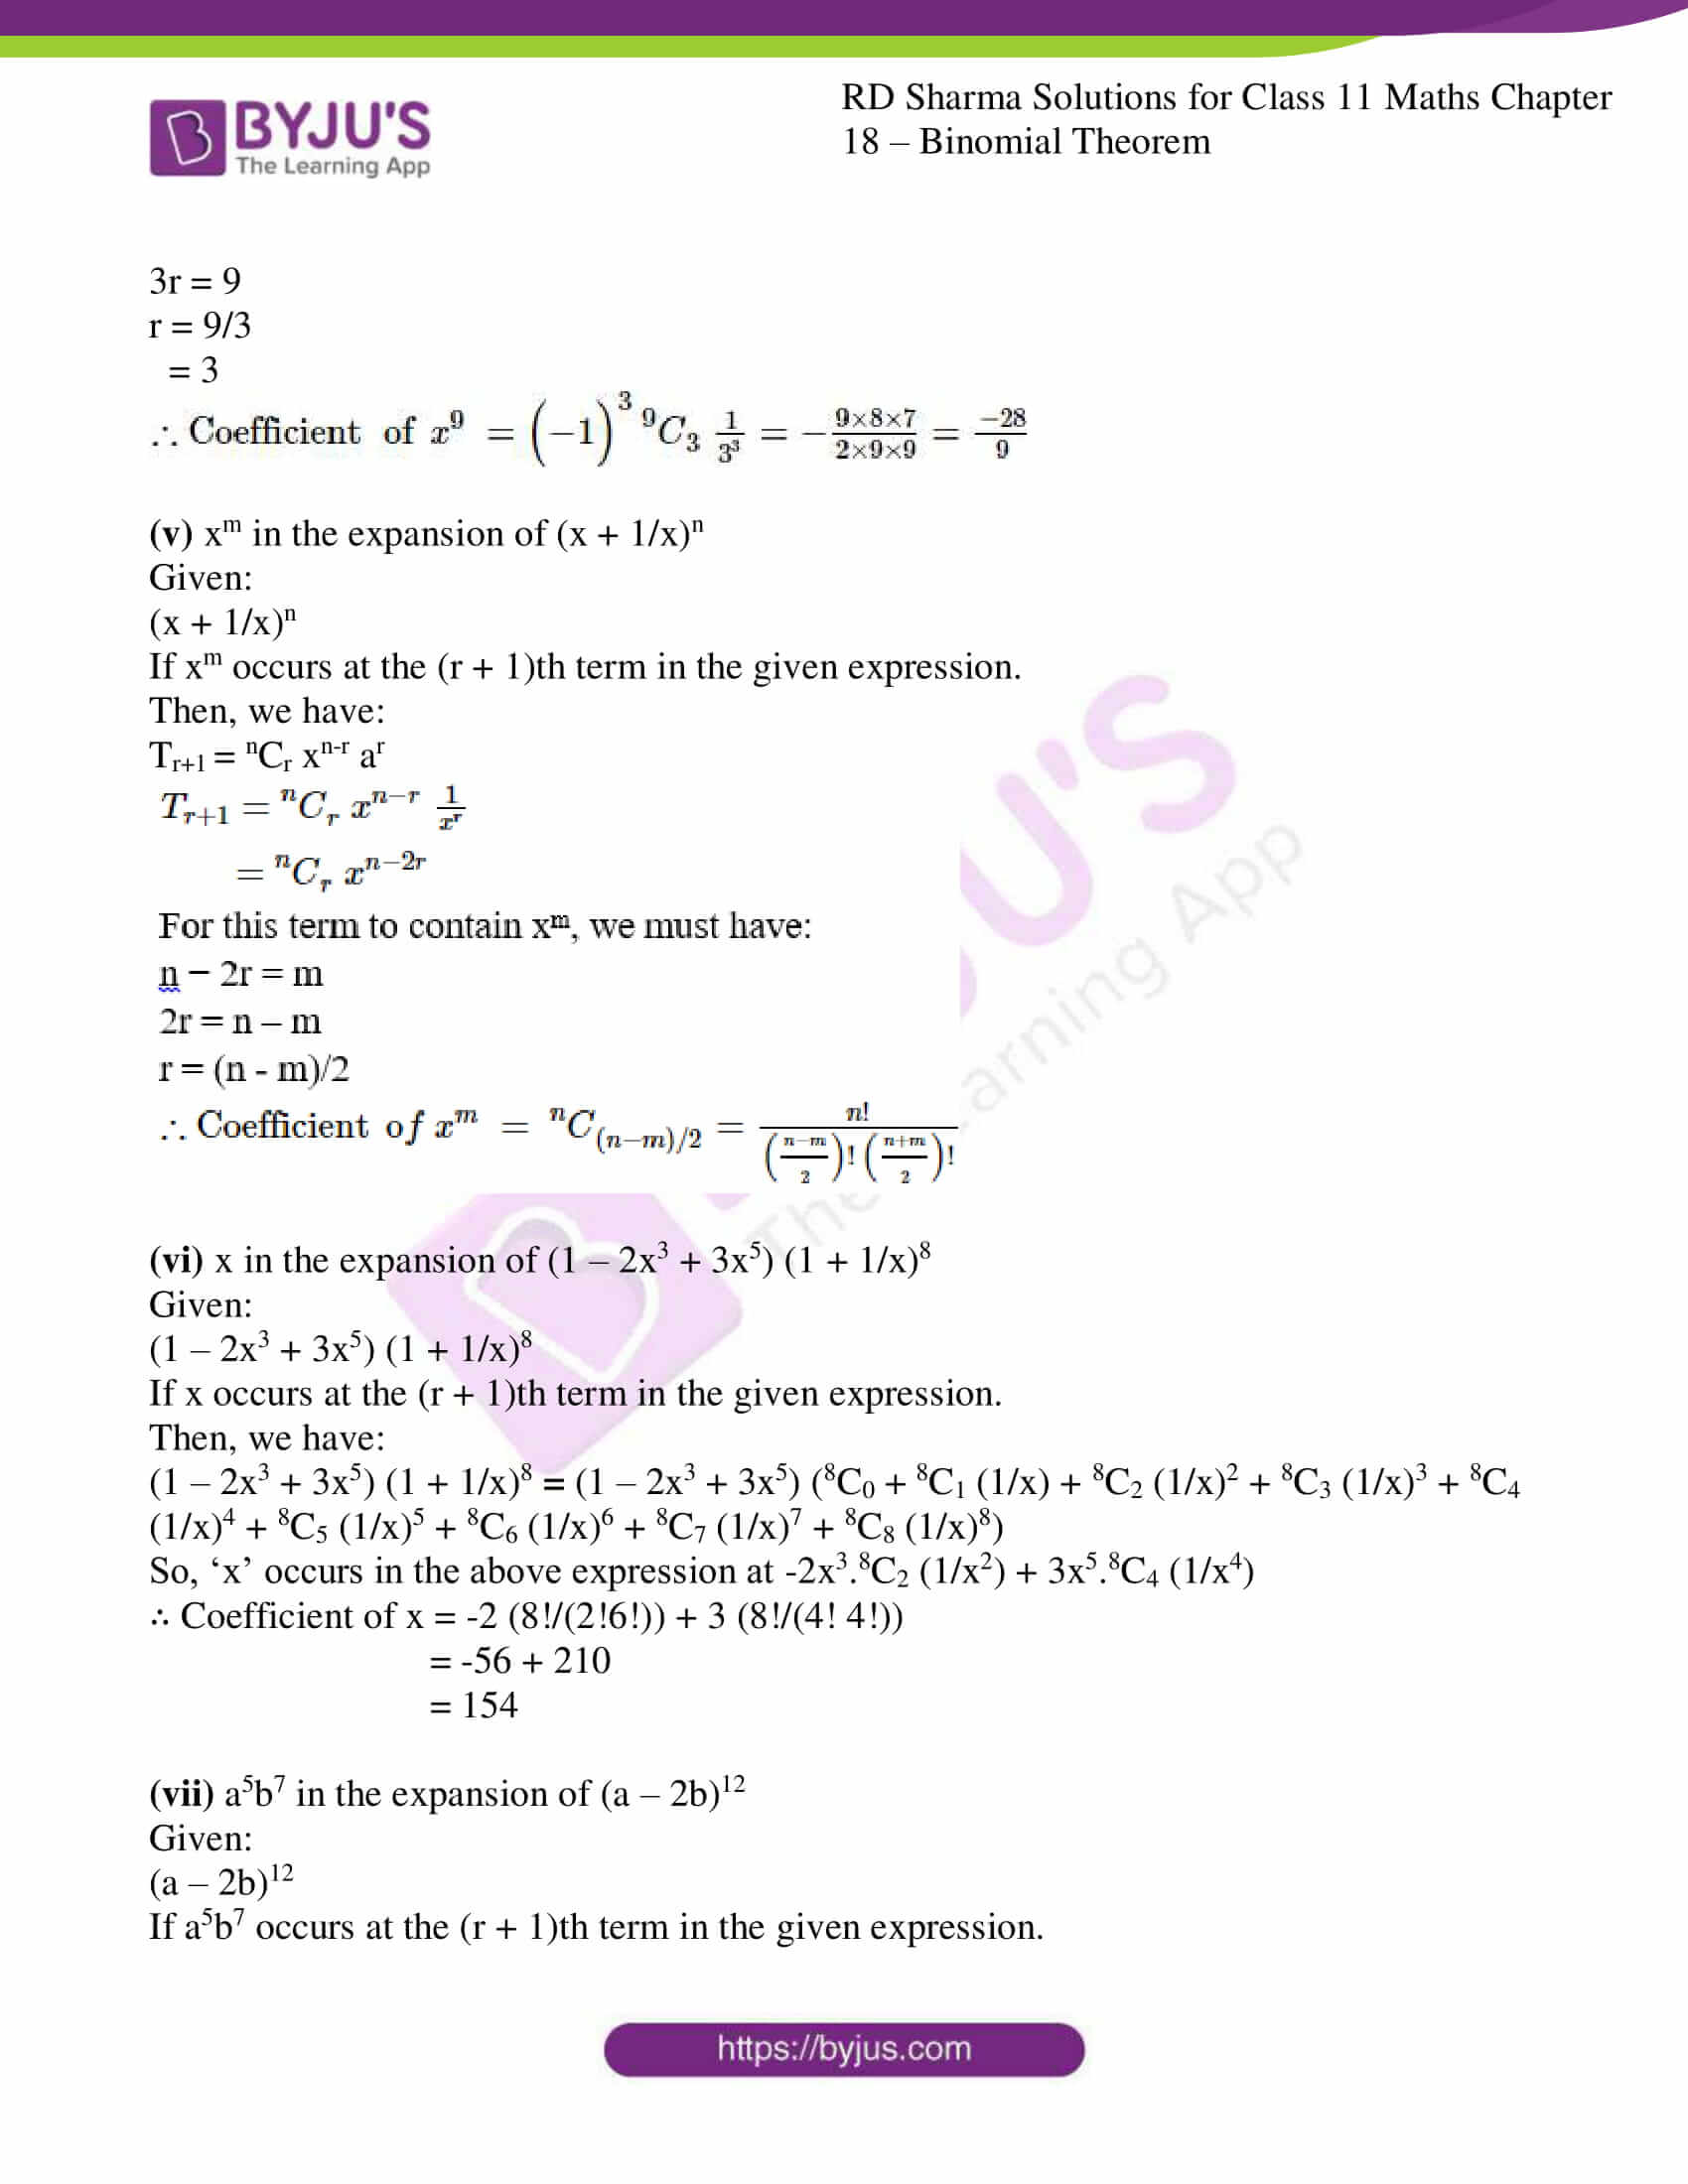 rd sharma class 11 maths ch 18 ex 2 06